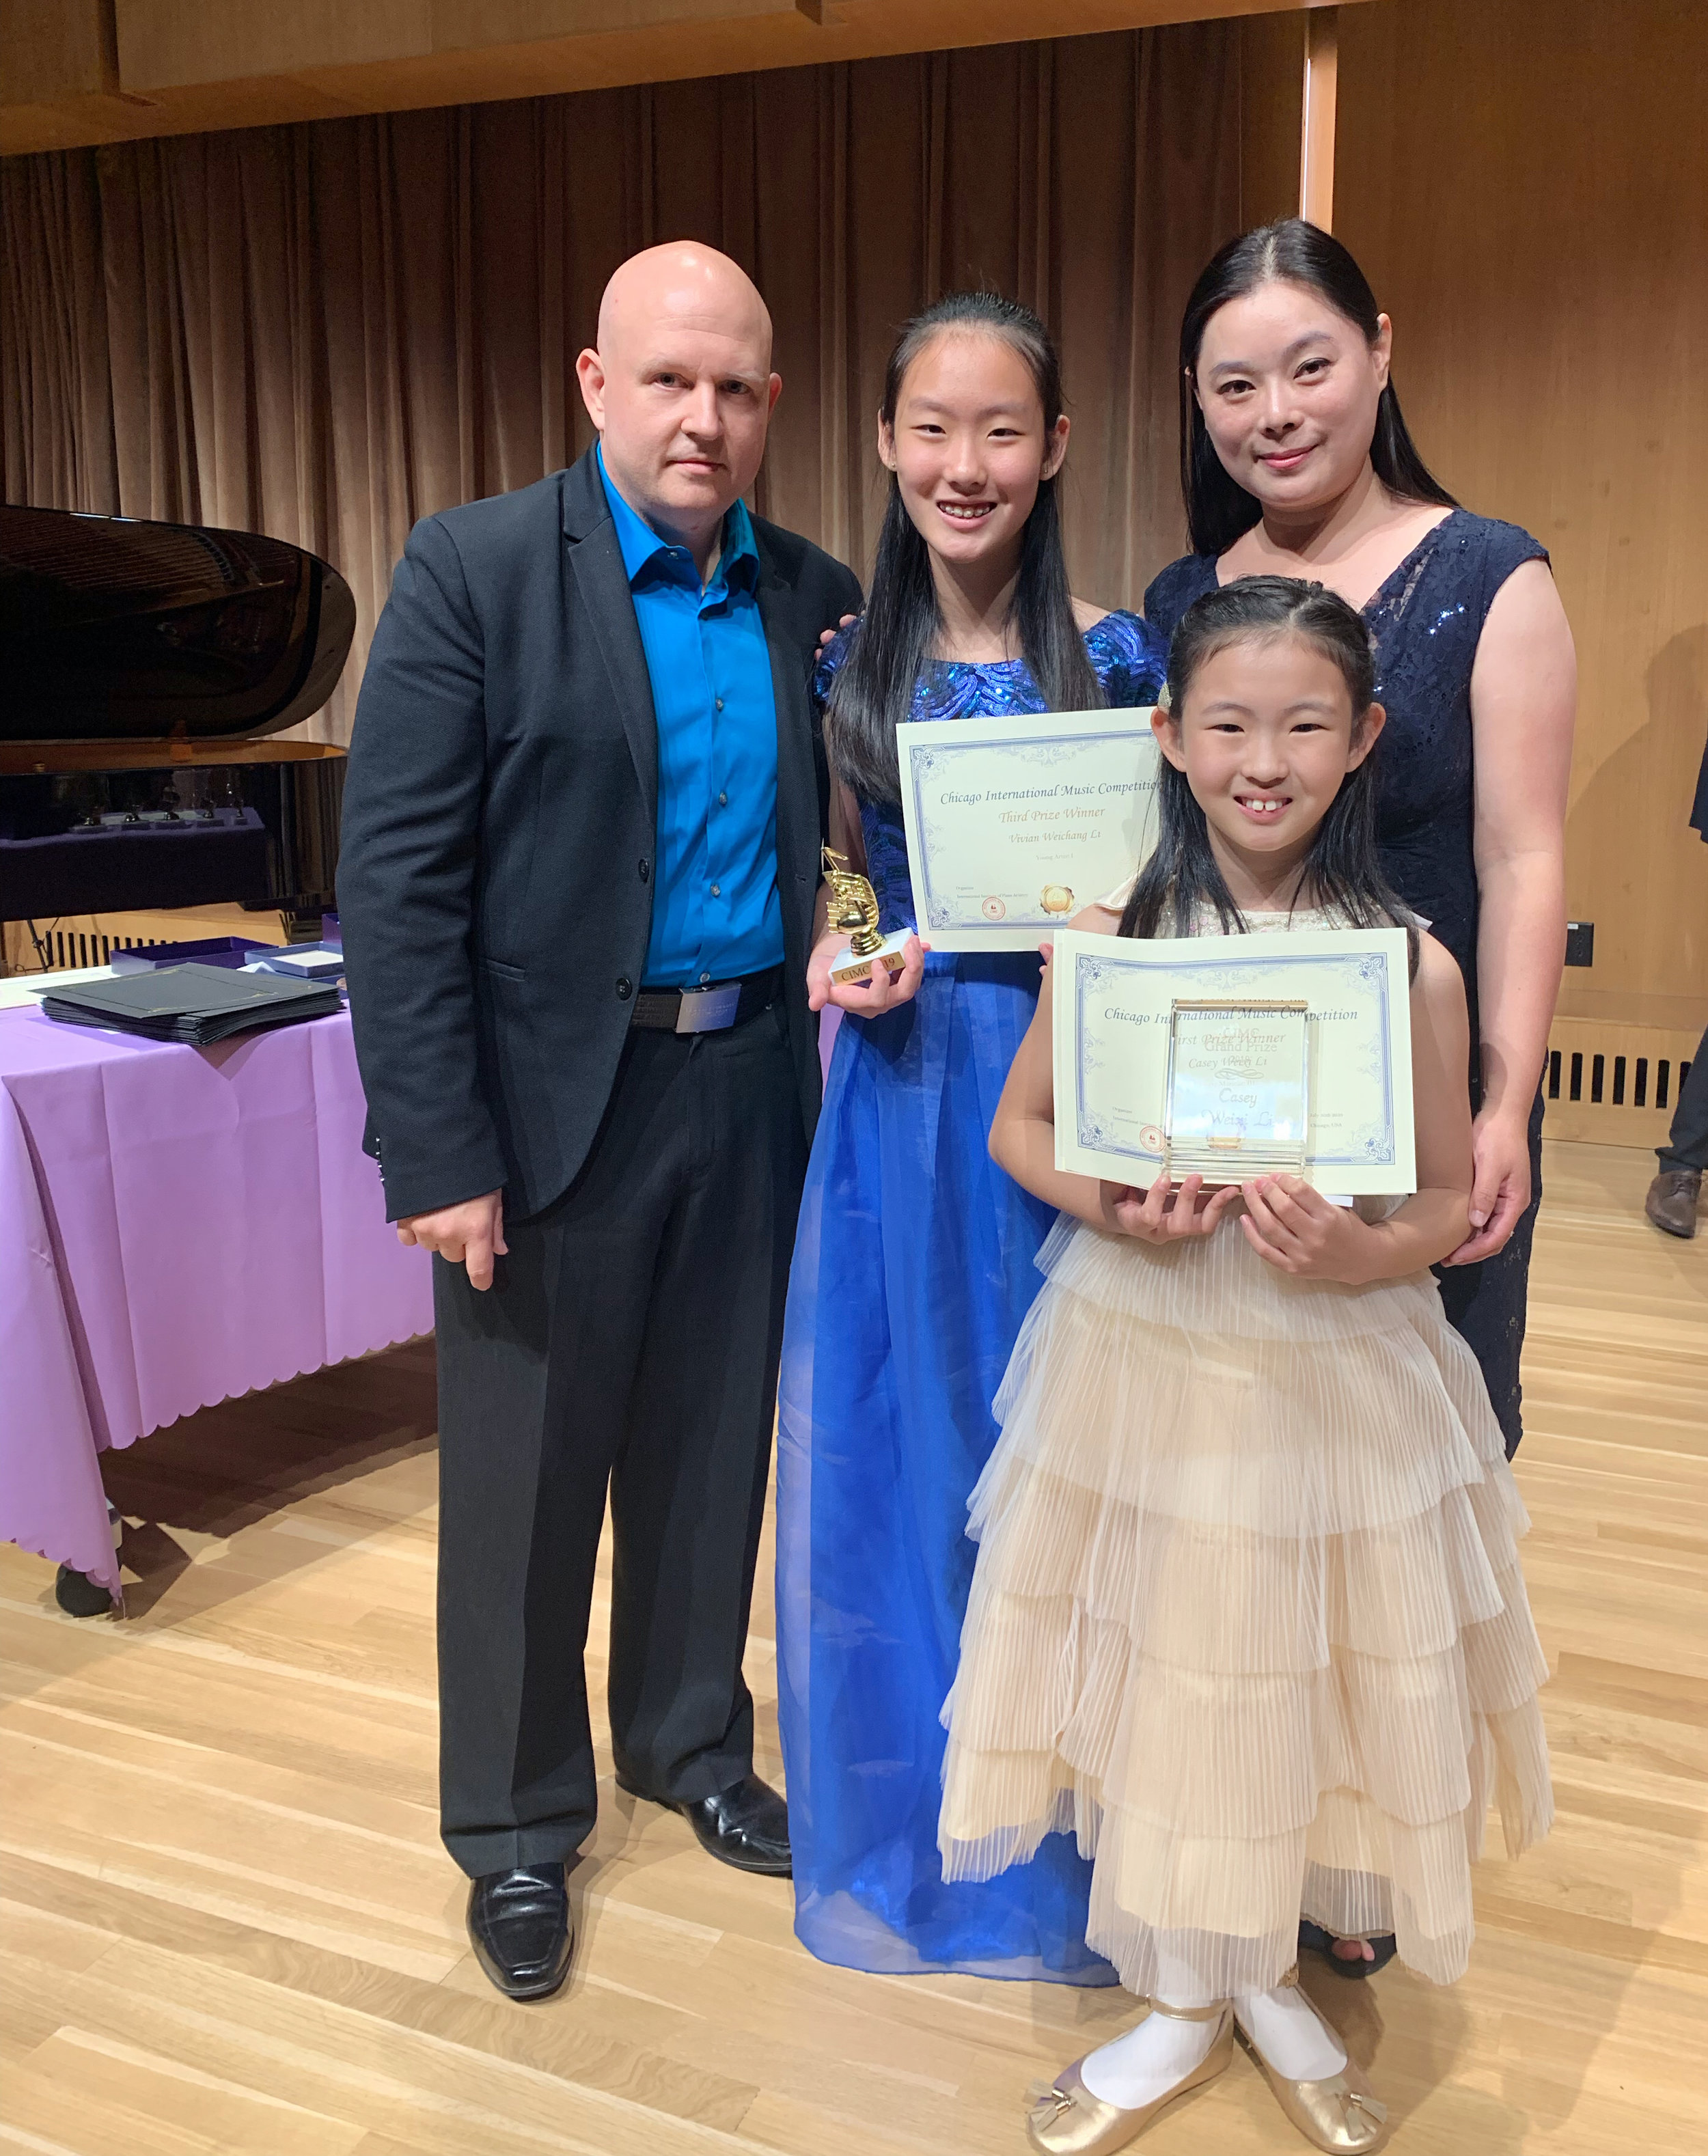 From left to right: Dr. Steven Spooner (Artistic Director of CIMC), Vivian Li, Casey Li, Dr. Mei Li (CEO of CIMC)